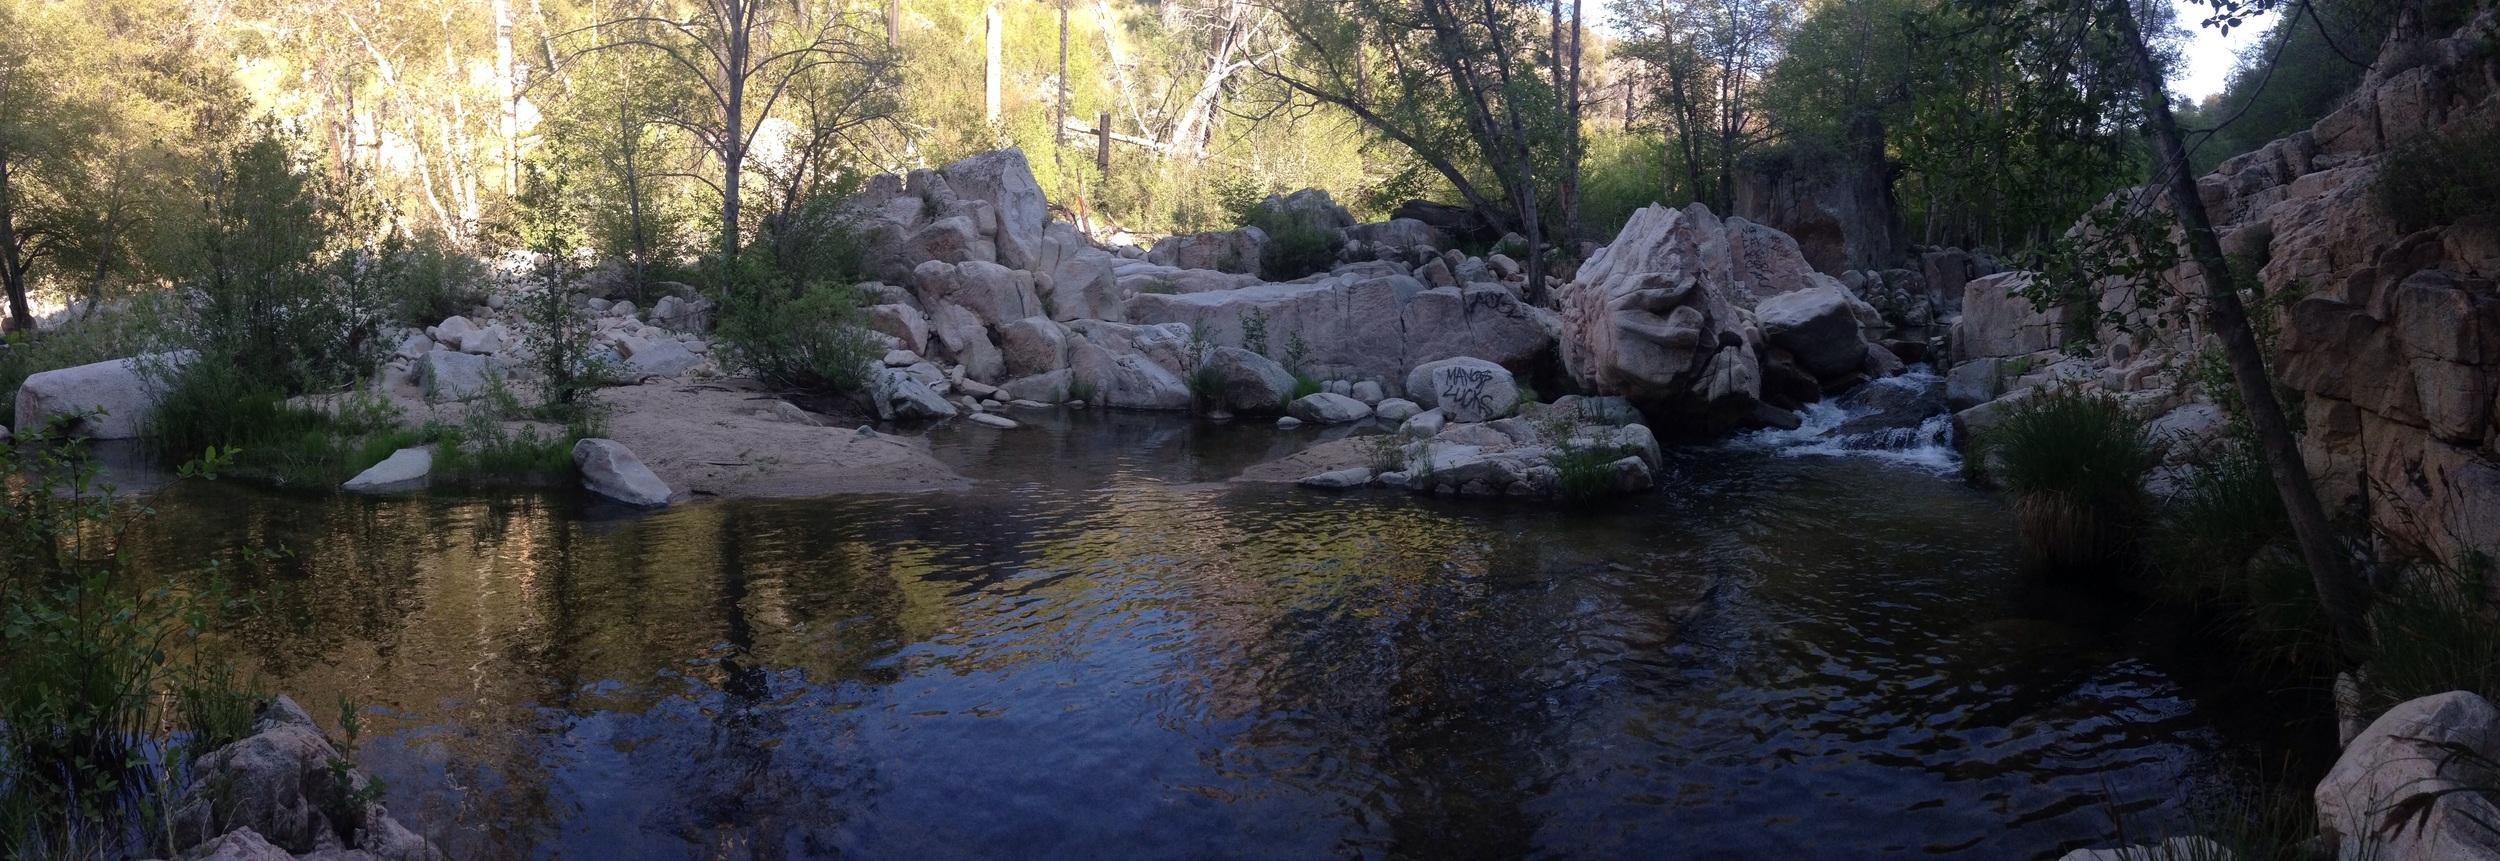 Secret swim spot, well worth a sketchy climb.